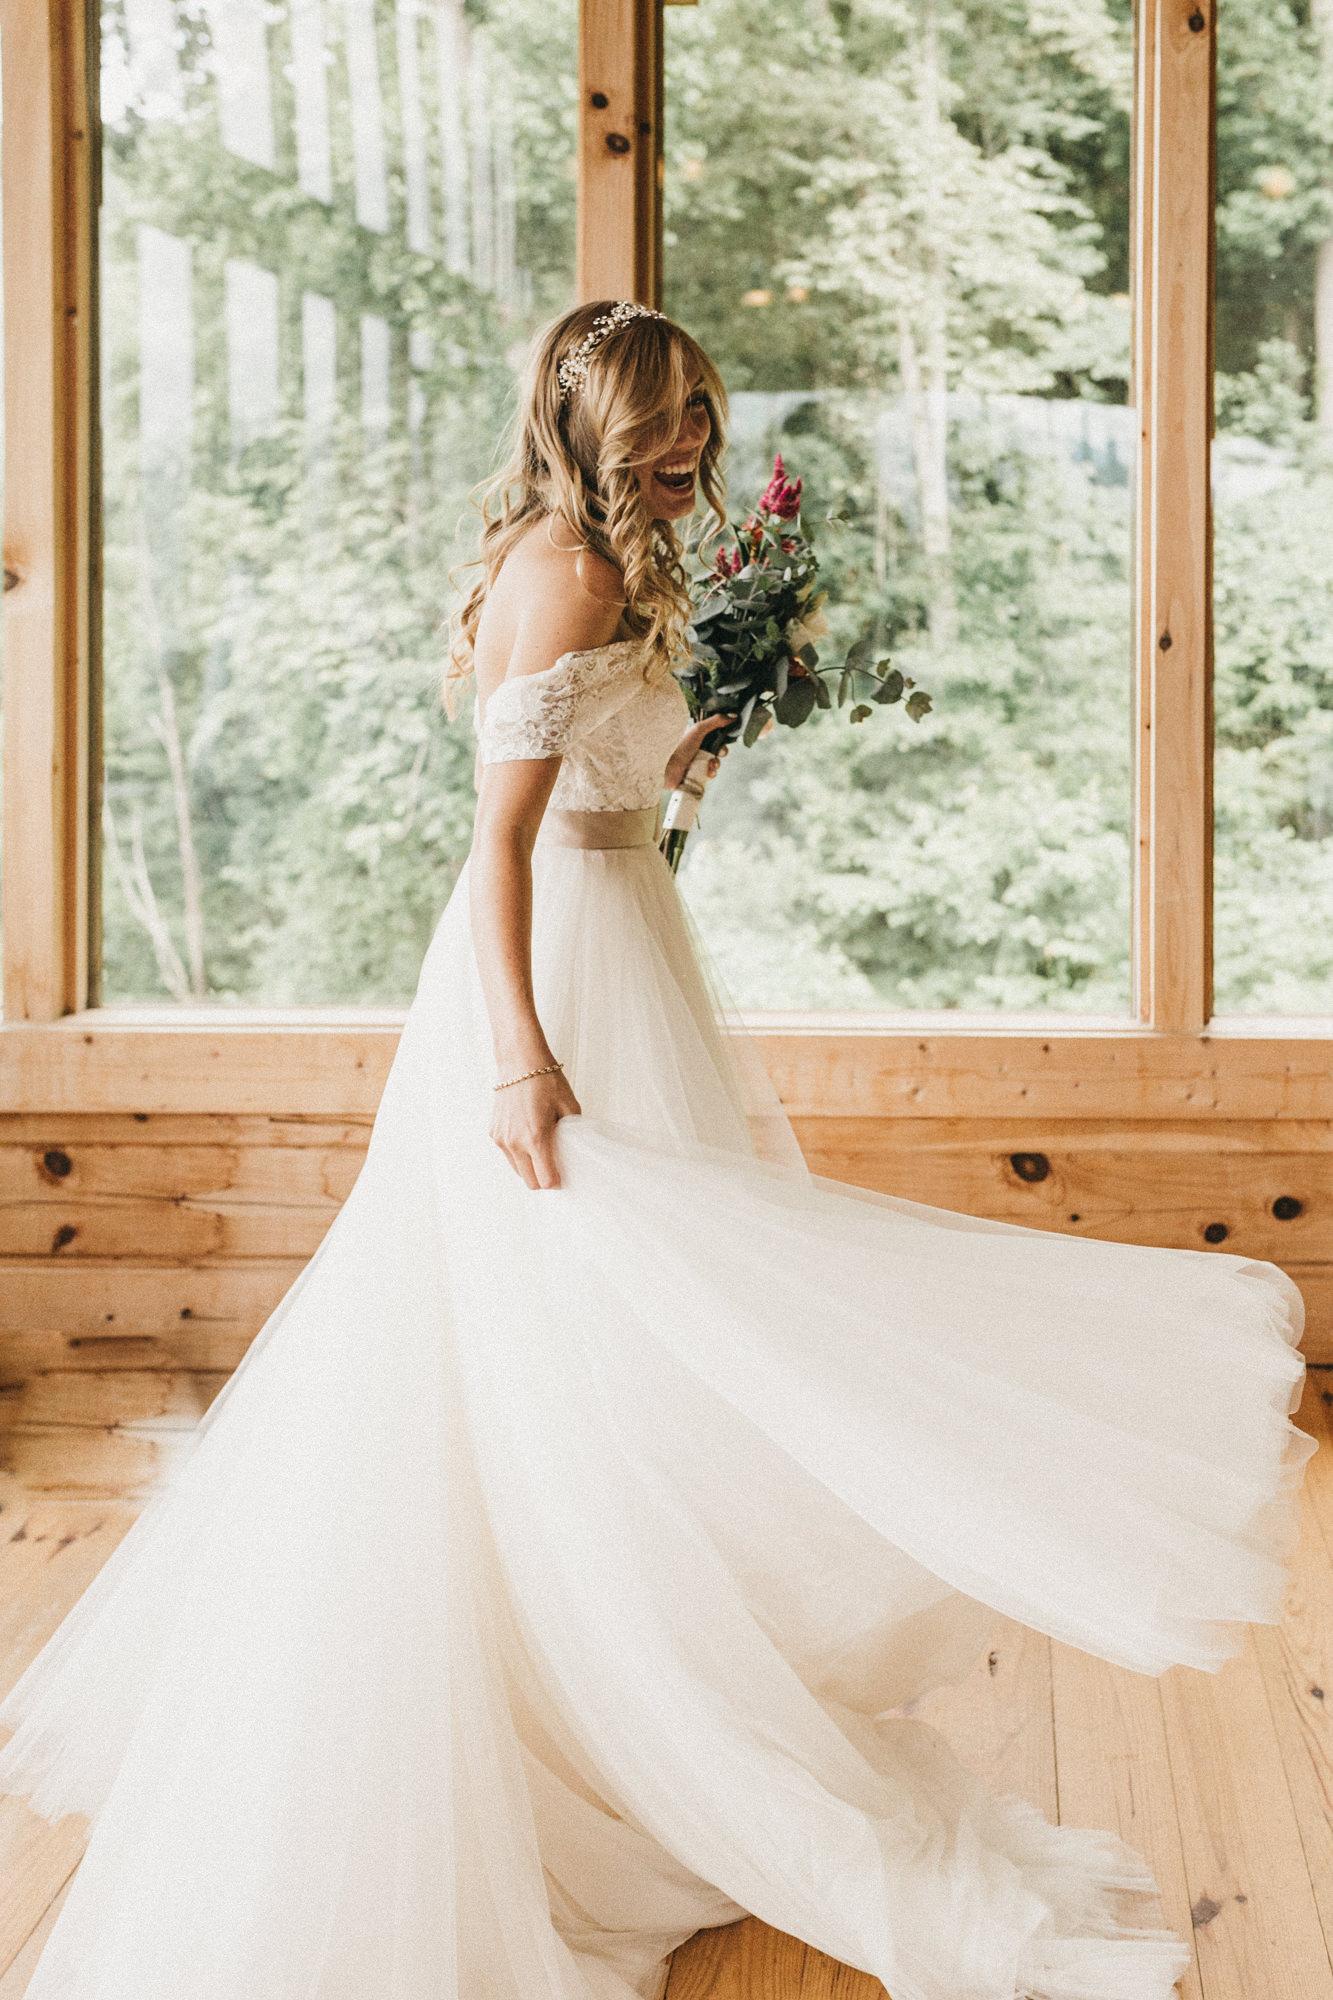 nashville_tennessee_wedding_photographer-51.jpg